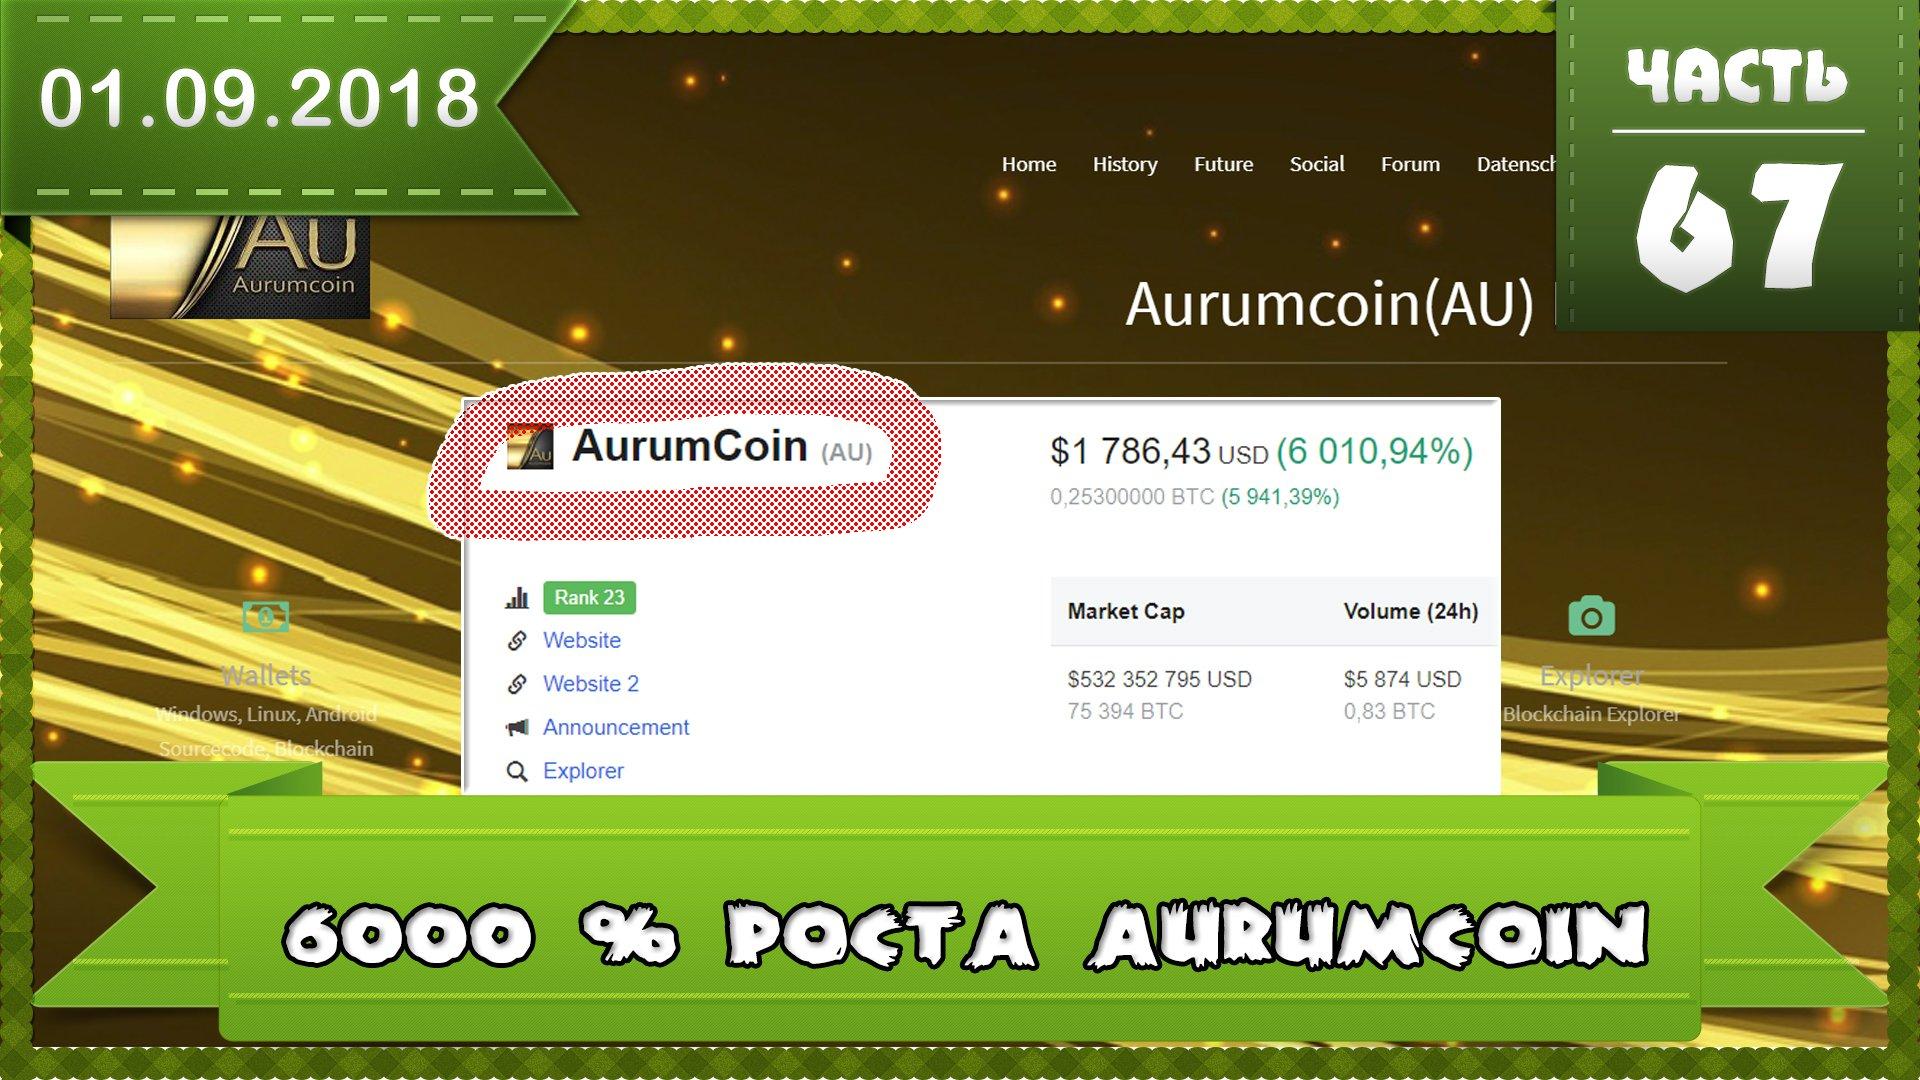 AURUMcoin памп рост на 6000% обзор валюты, анализ полета туземун